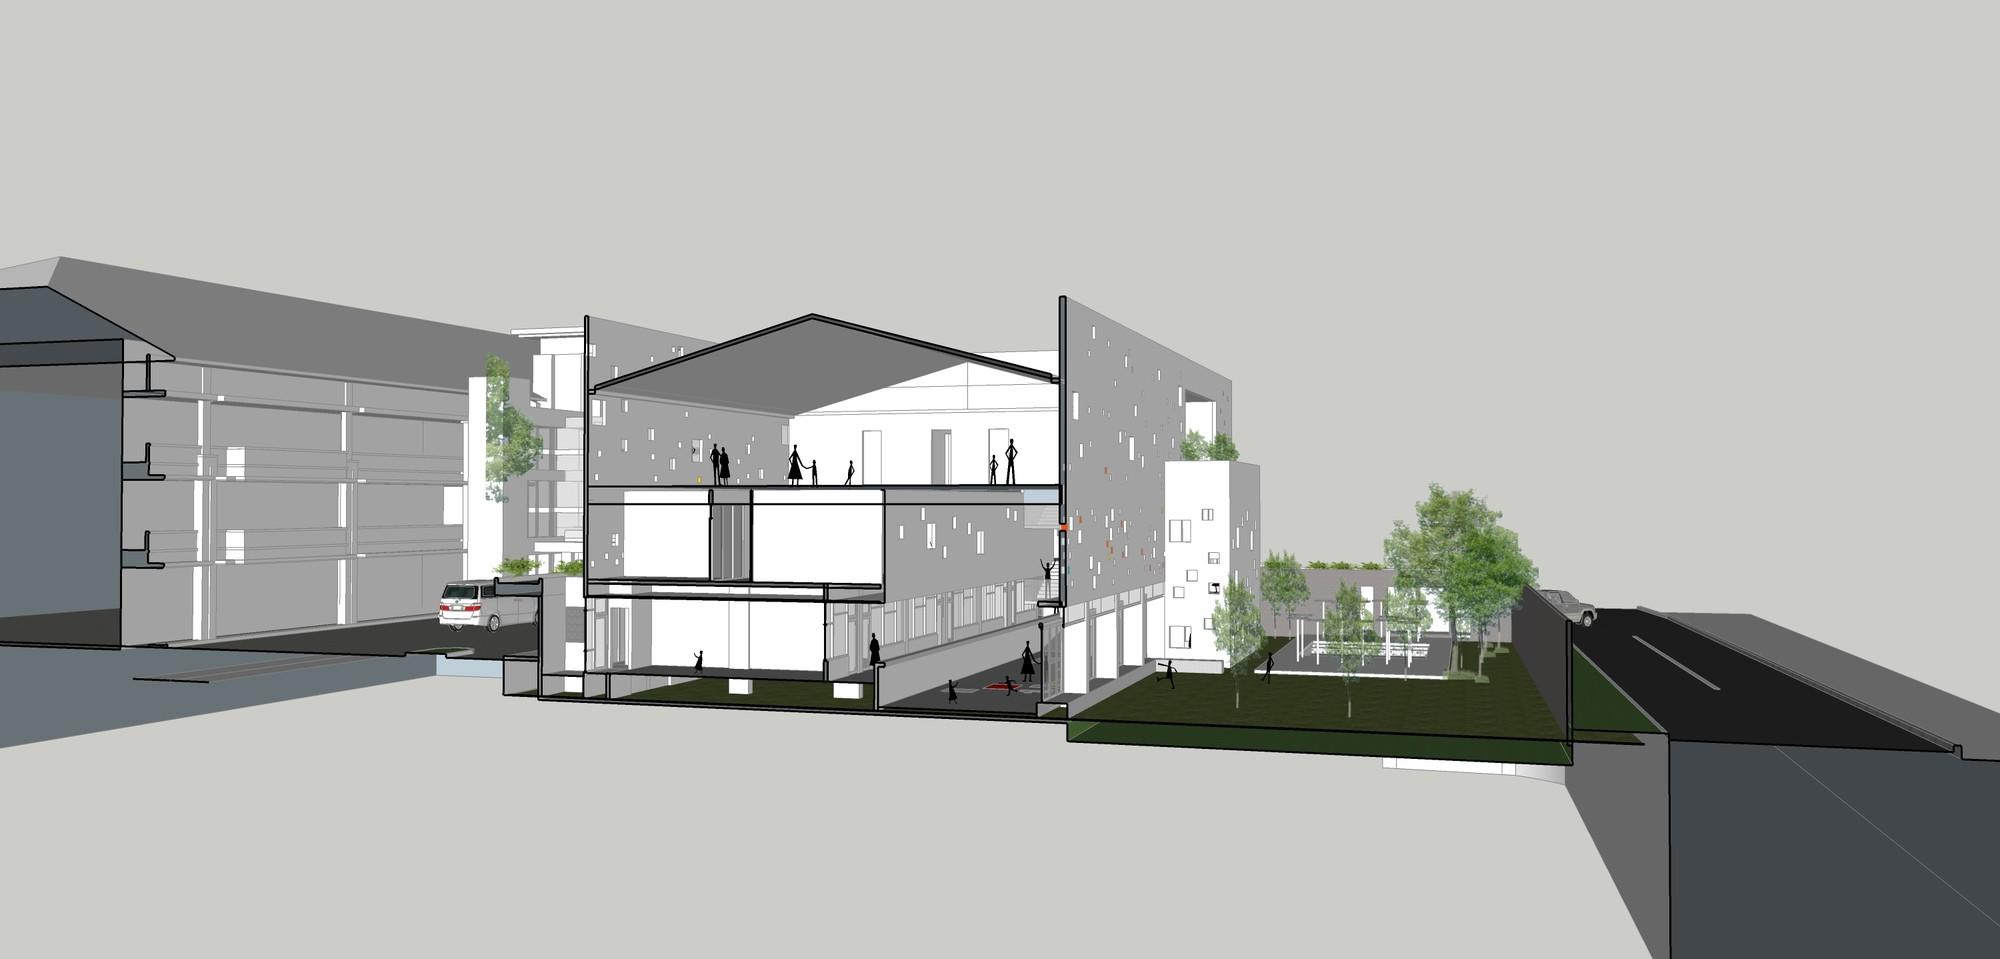 Sekolah bogor raya indra tata adilaras archdaily for Semi open spaces